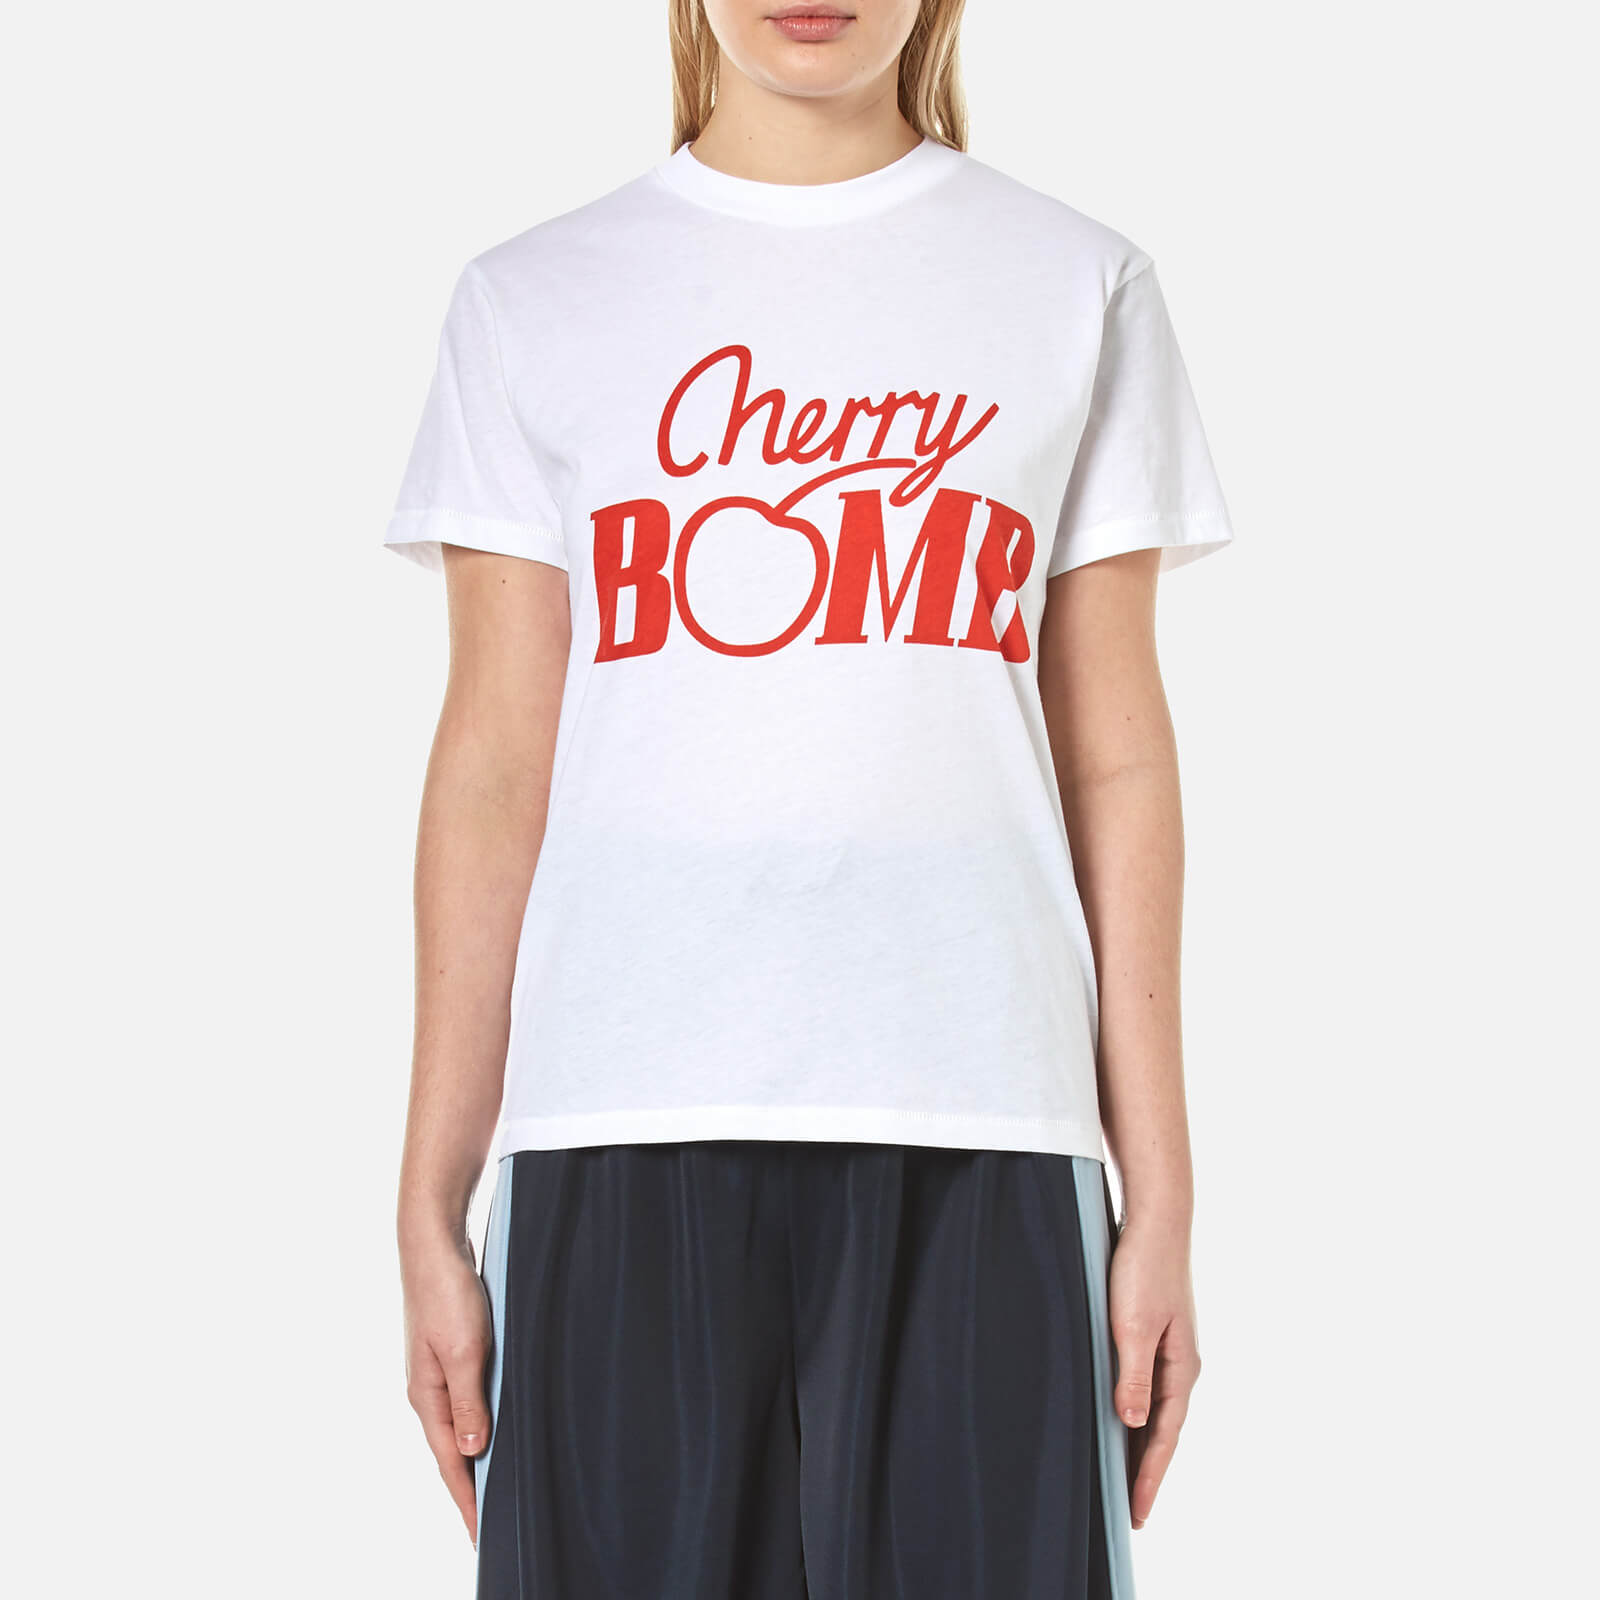 d58c9dbf2bb3d9 Ganni Women s Harvard Cherry Bomb T-Shirt - Bright White - Free UK Delivery  over £50